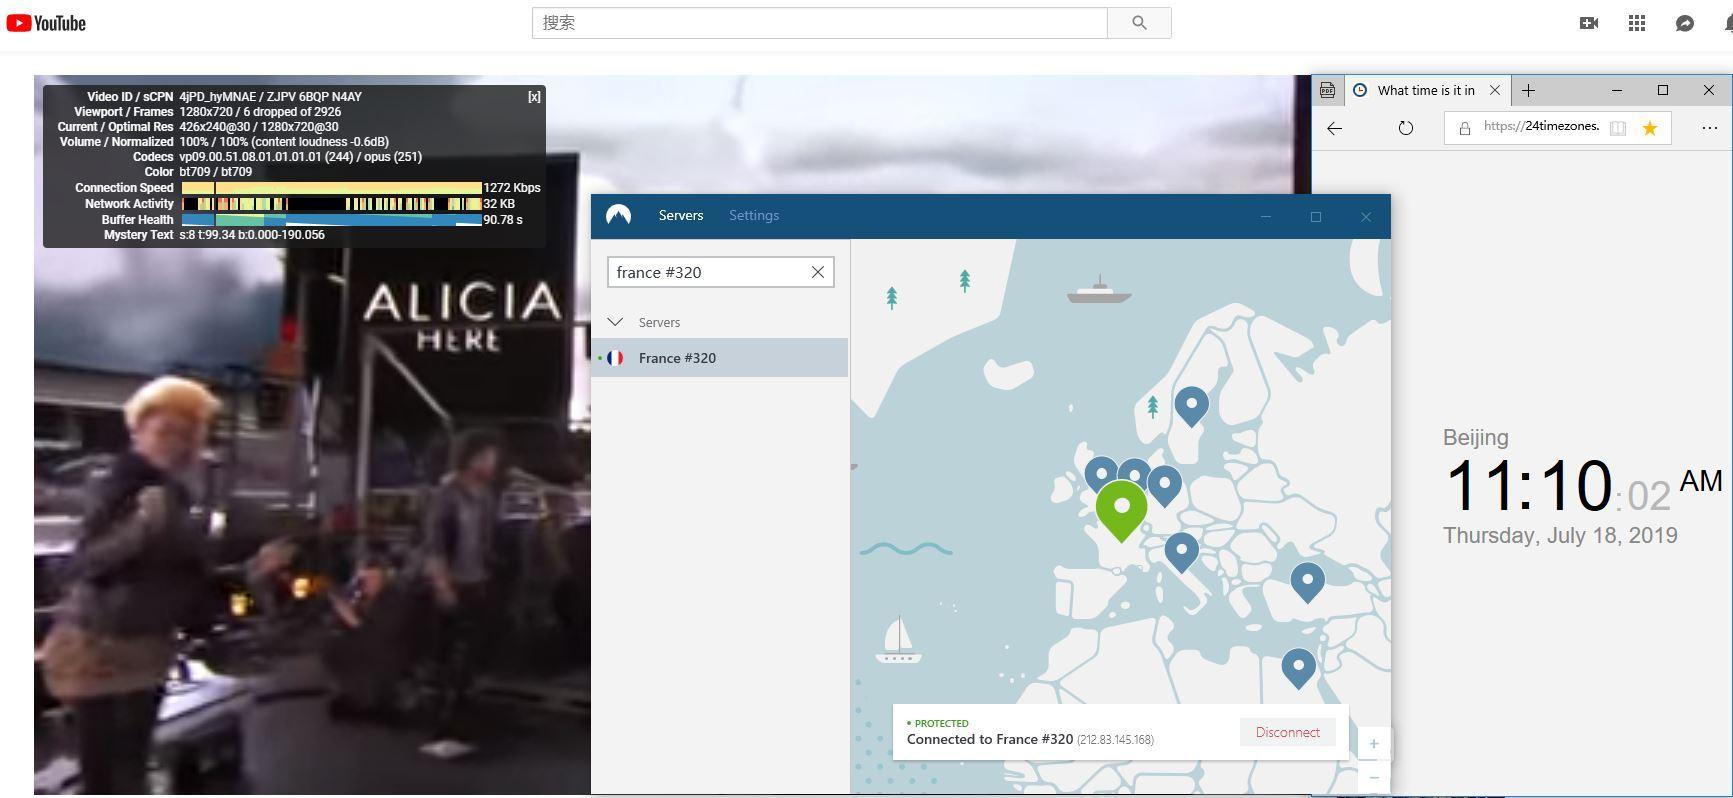 NordVPN Windows 翻墙 科学上午 法国-320服务器 YouTube速度测试-20190718